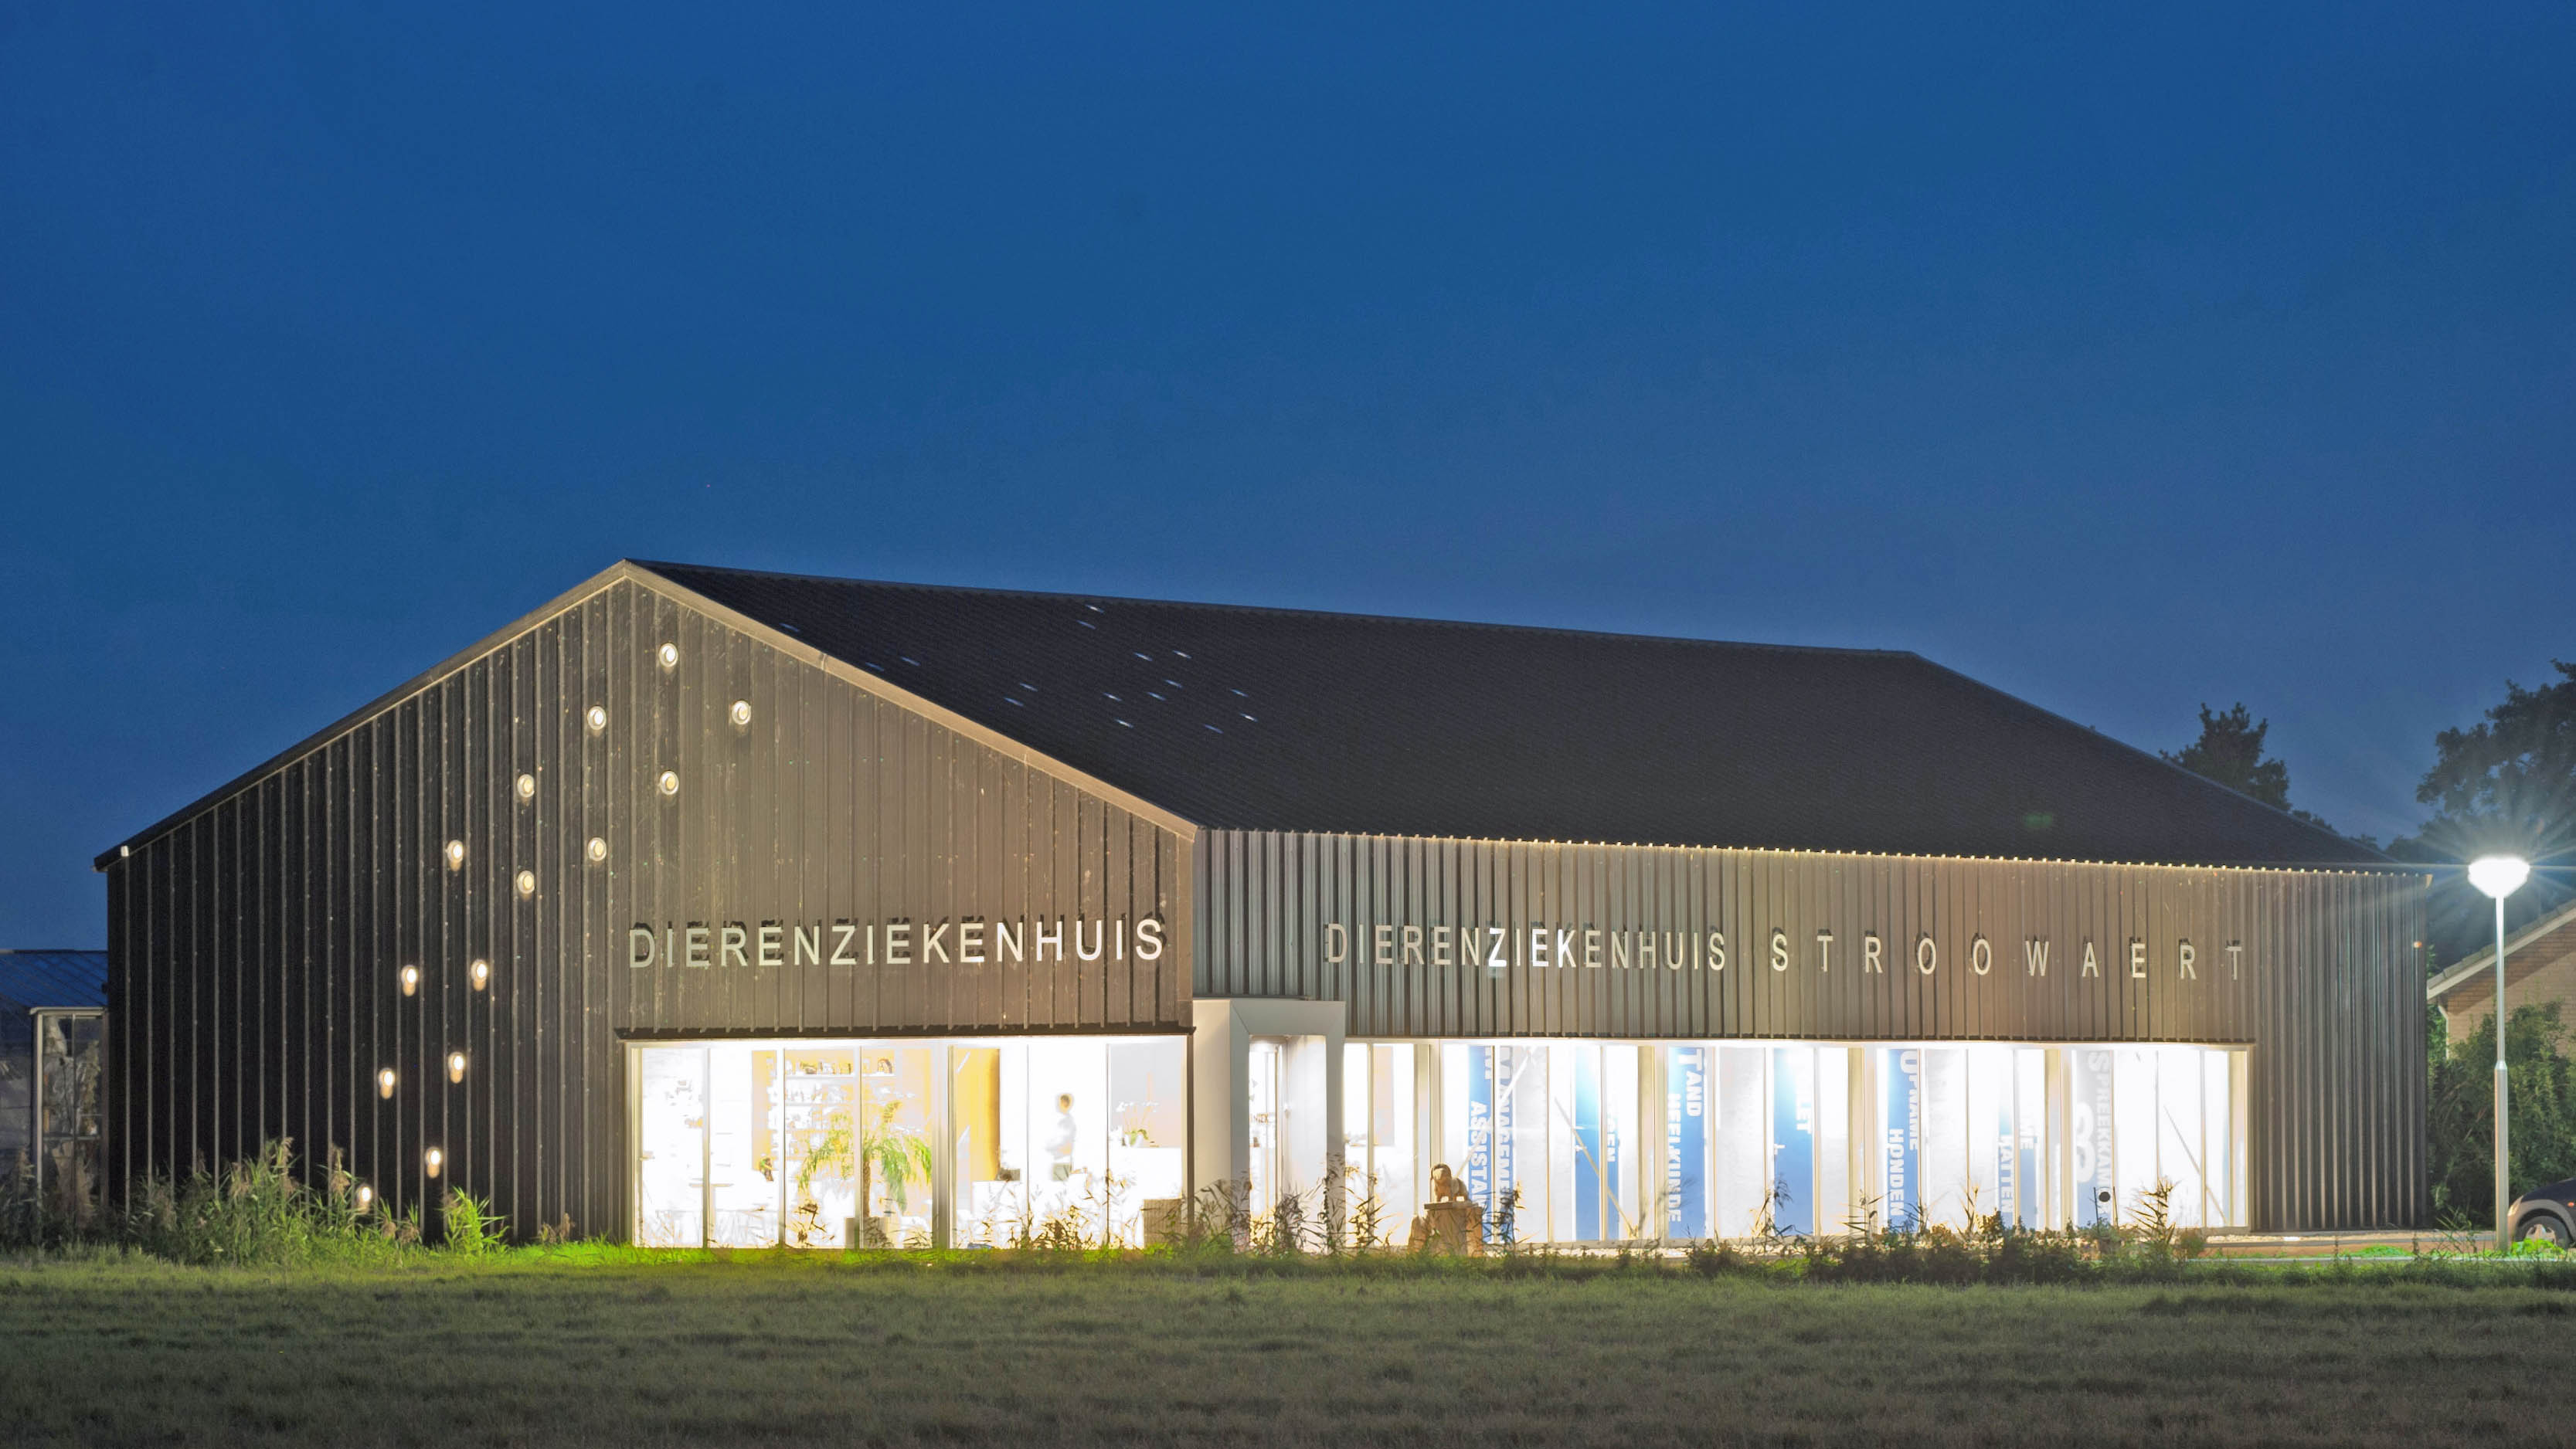 dierenziekenhuis stroowaert oud-beijerland architect marja haring